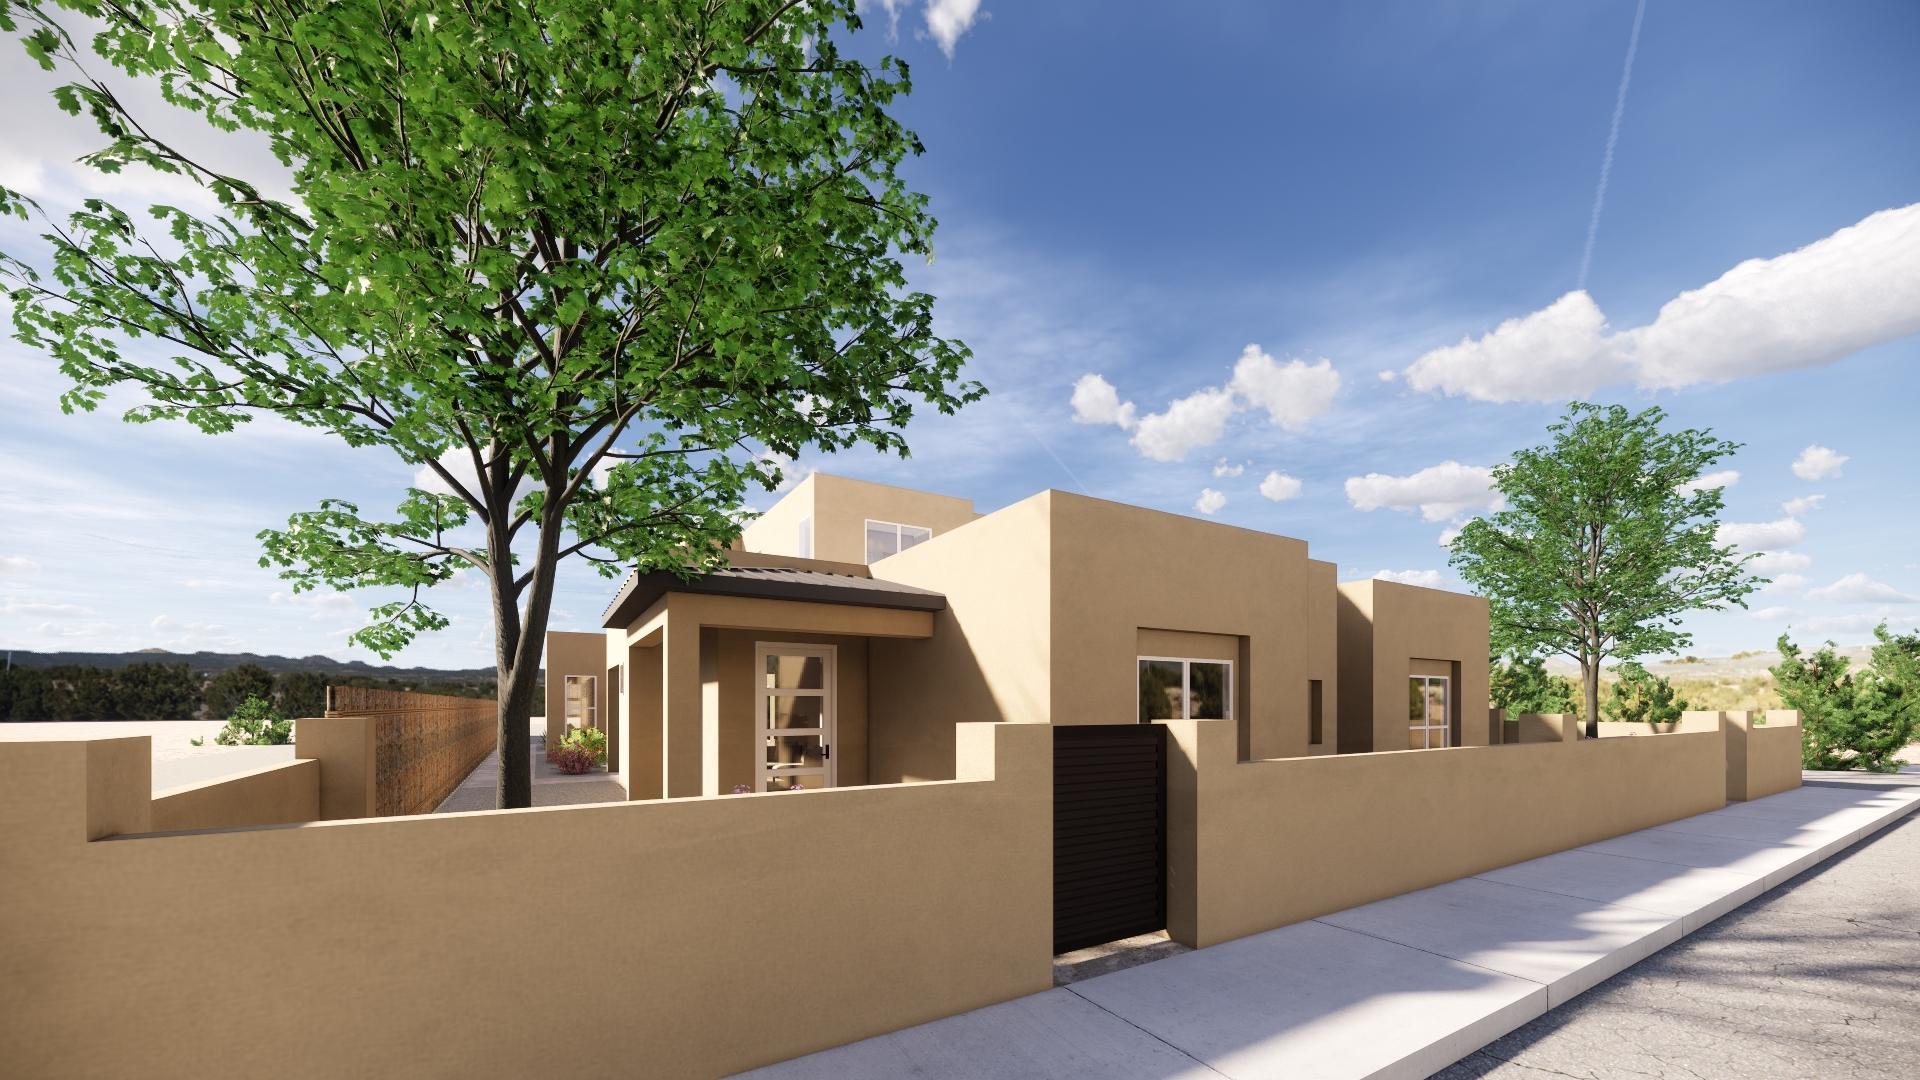 34 BLUE FEATHER Road, Santa Fe, NM 87508 - Santa Fe, NM real estate listing